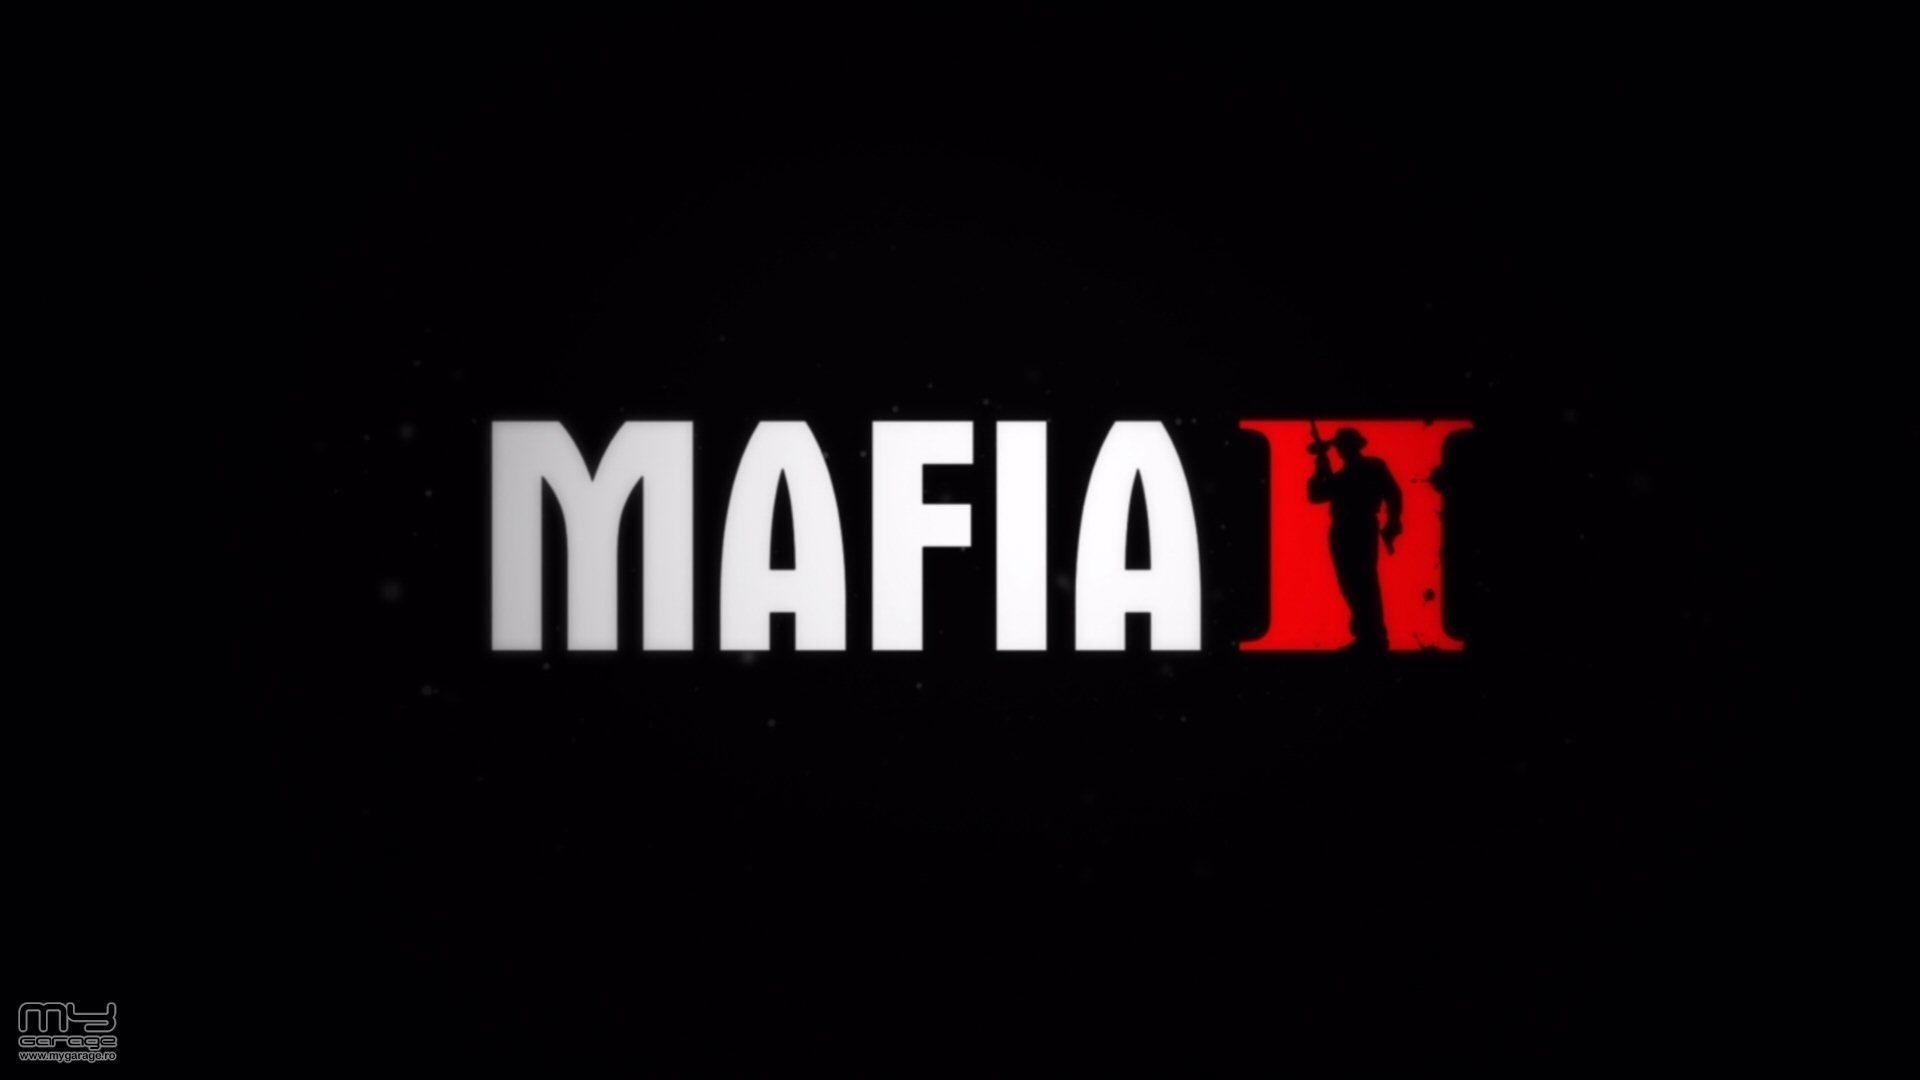 HQ Definition Cool Mafia Pics HD Wallpapers